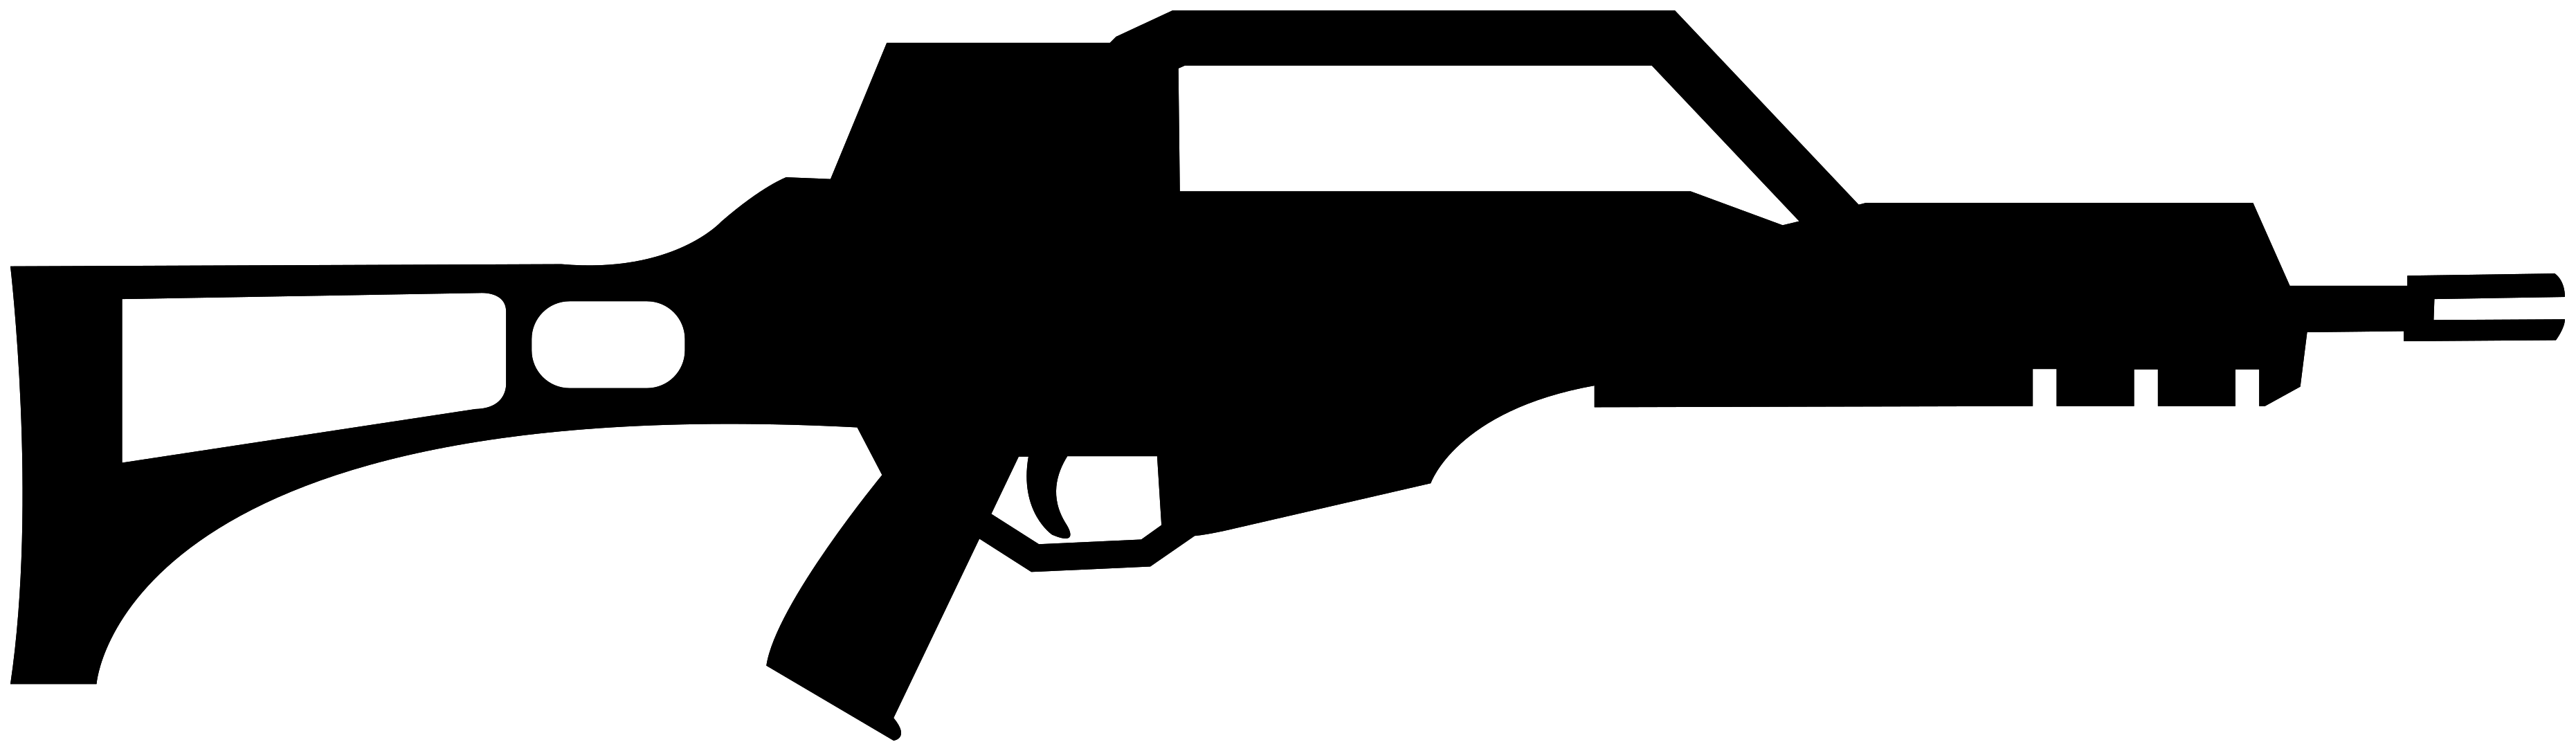 Naklejka na ścianę famas karabin